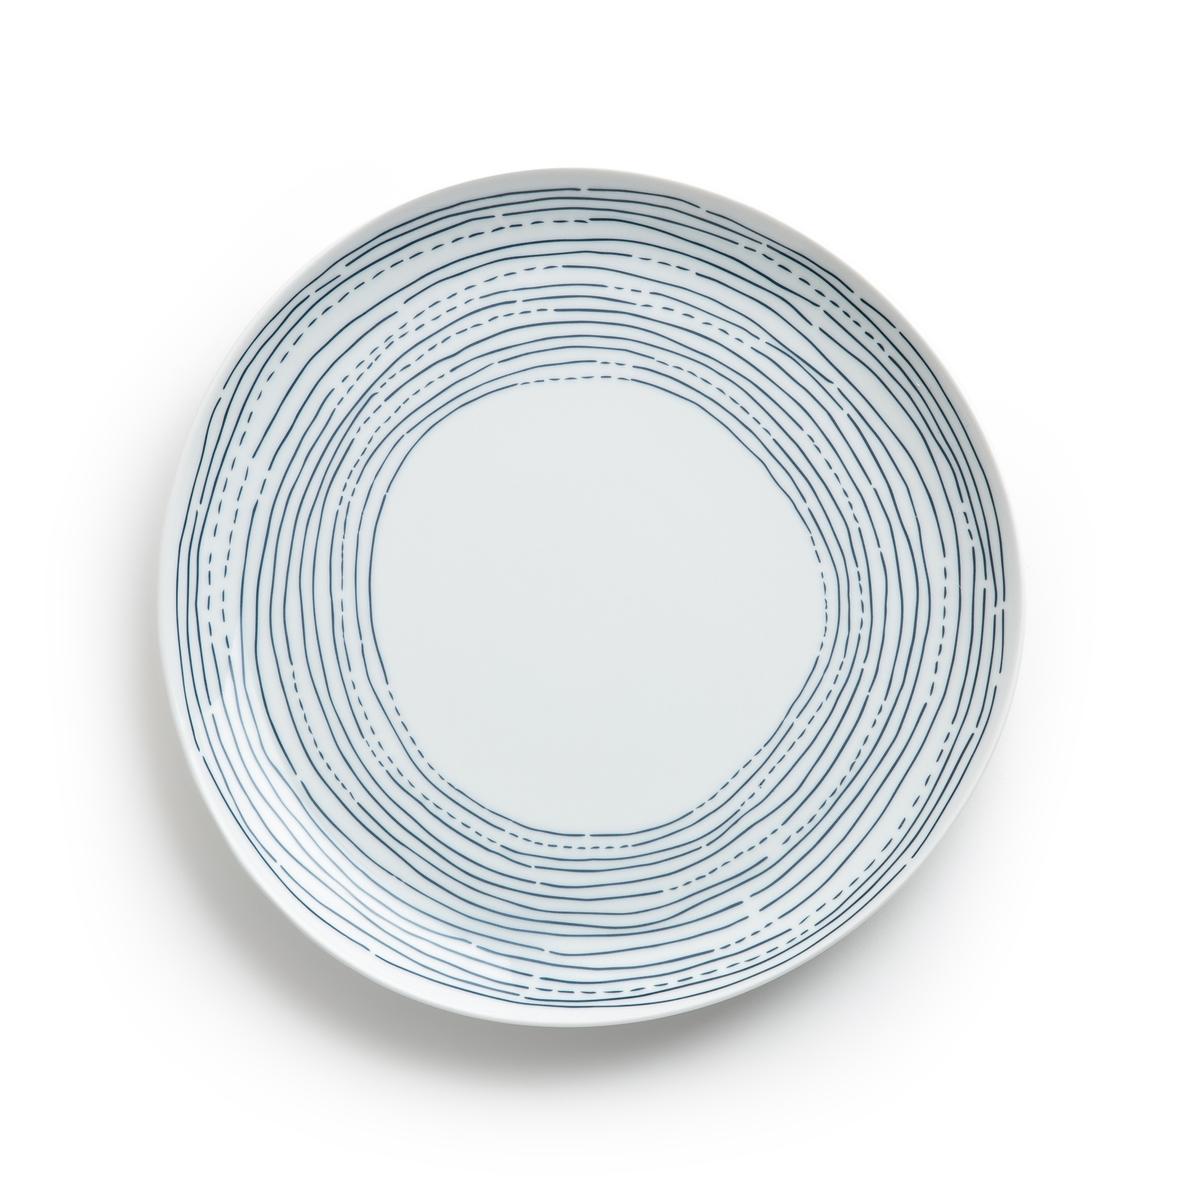 Комплект из 4 мелких тарелок из фарфора, Ø25 см, Agaxan 4 тарелки мелкие фарфоровые shigoni